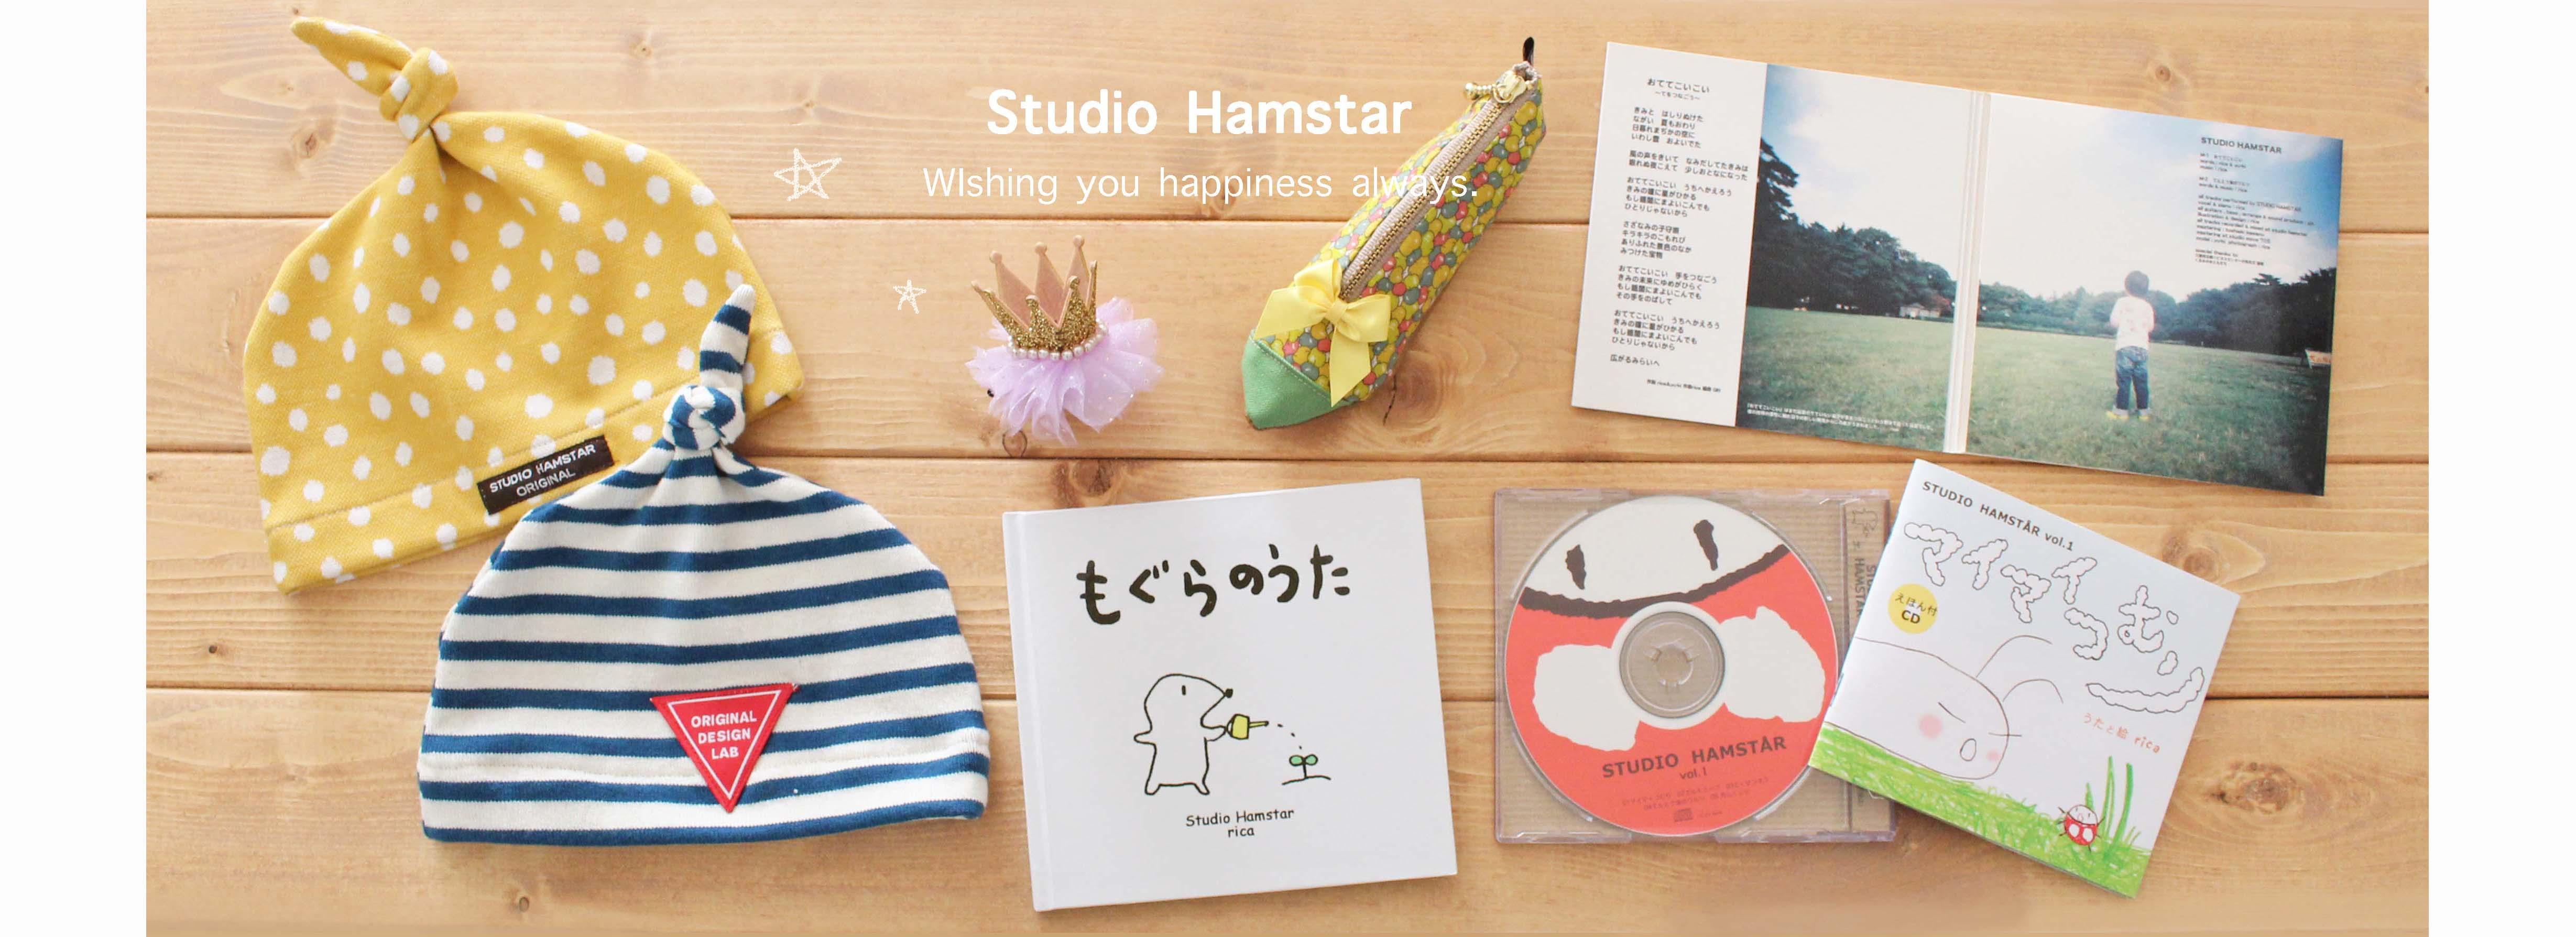 Studio Hamstar